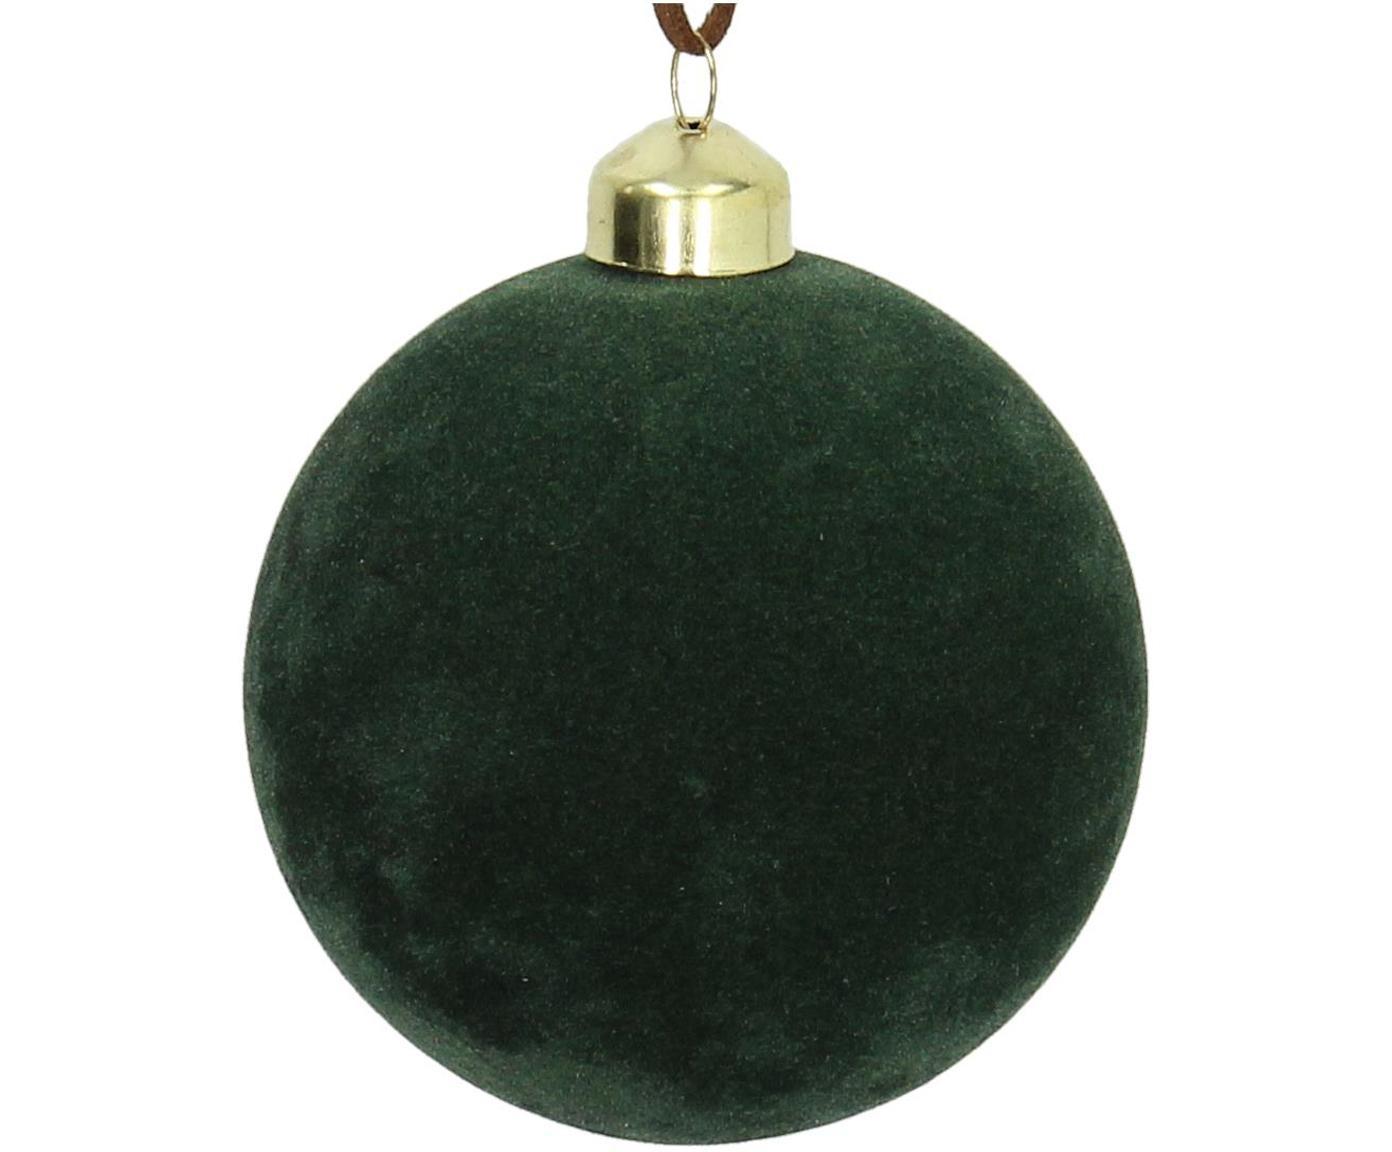 Samt-Weihnachtskugeln Elvien, 4 Stück, Grün, Ø 8 cm